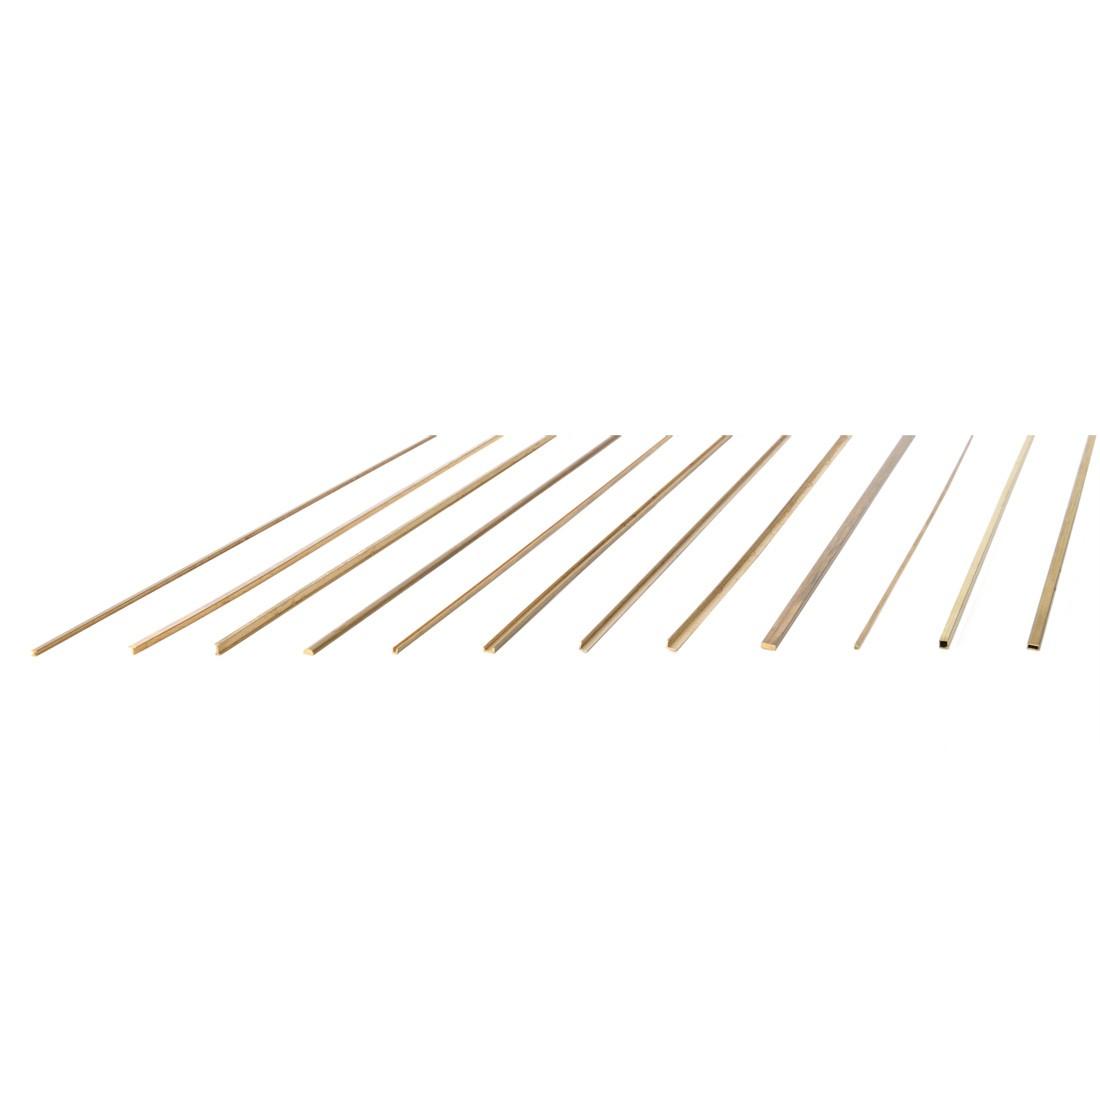 Microprofilati Ottone mm. 2x2x500 sez. U